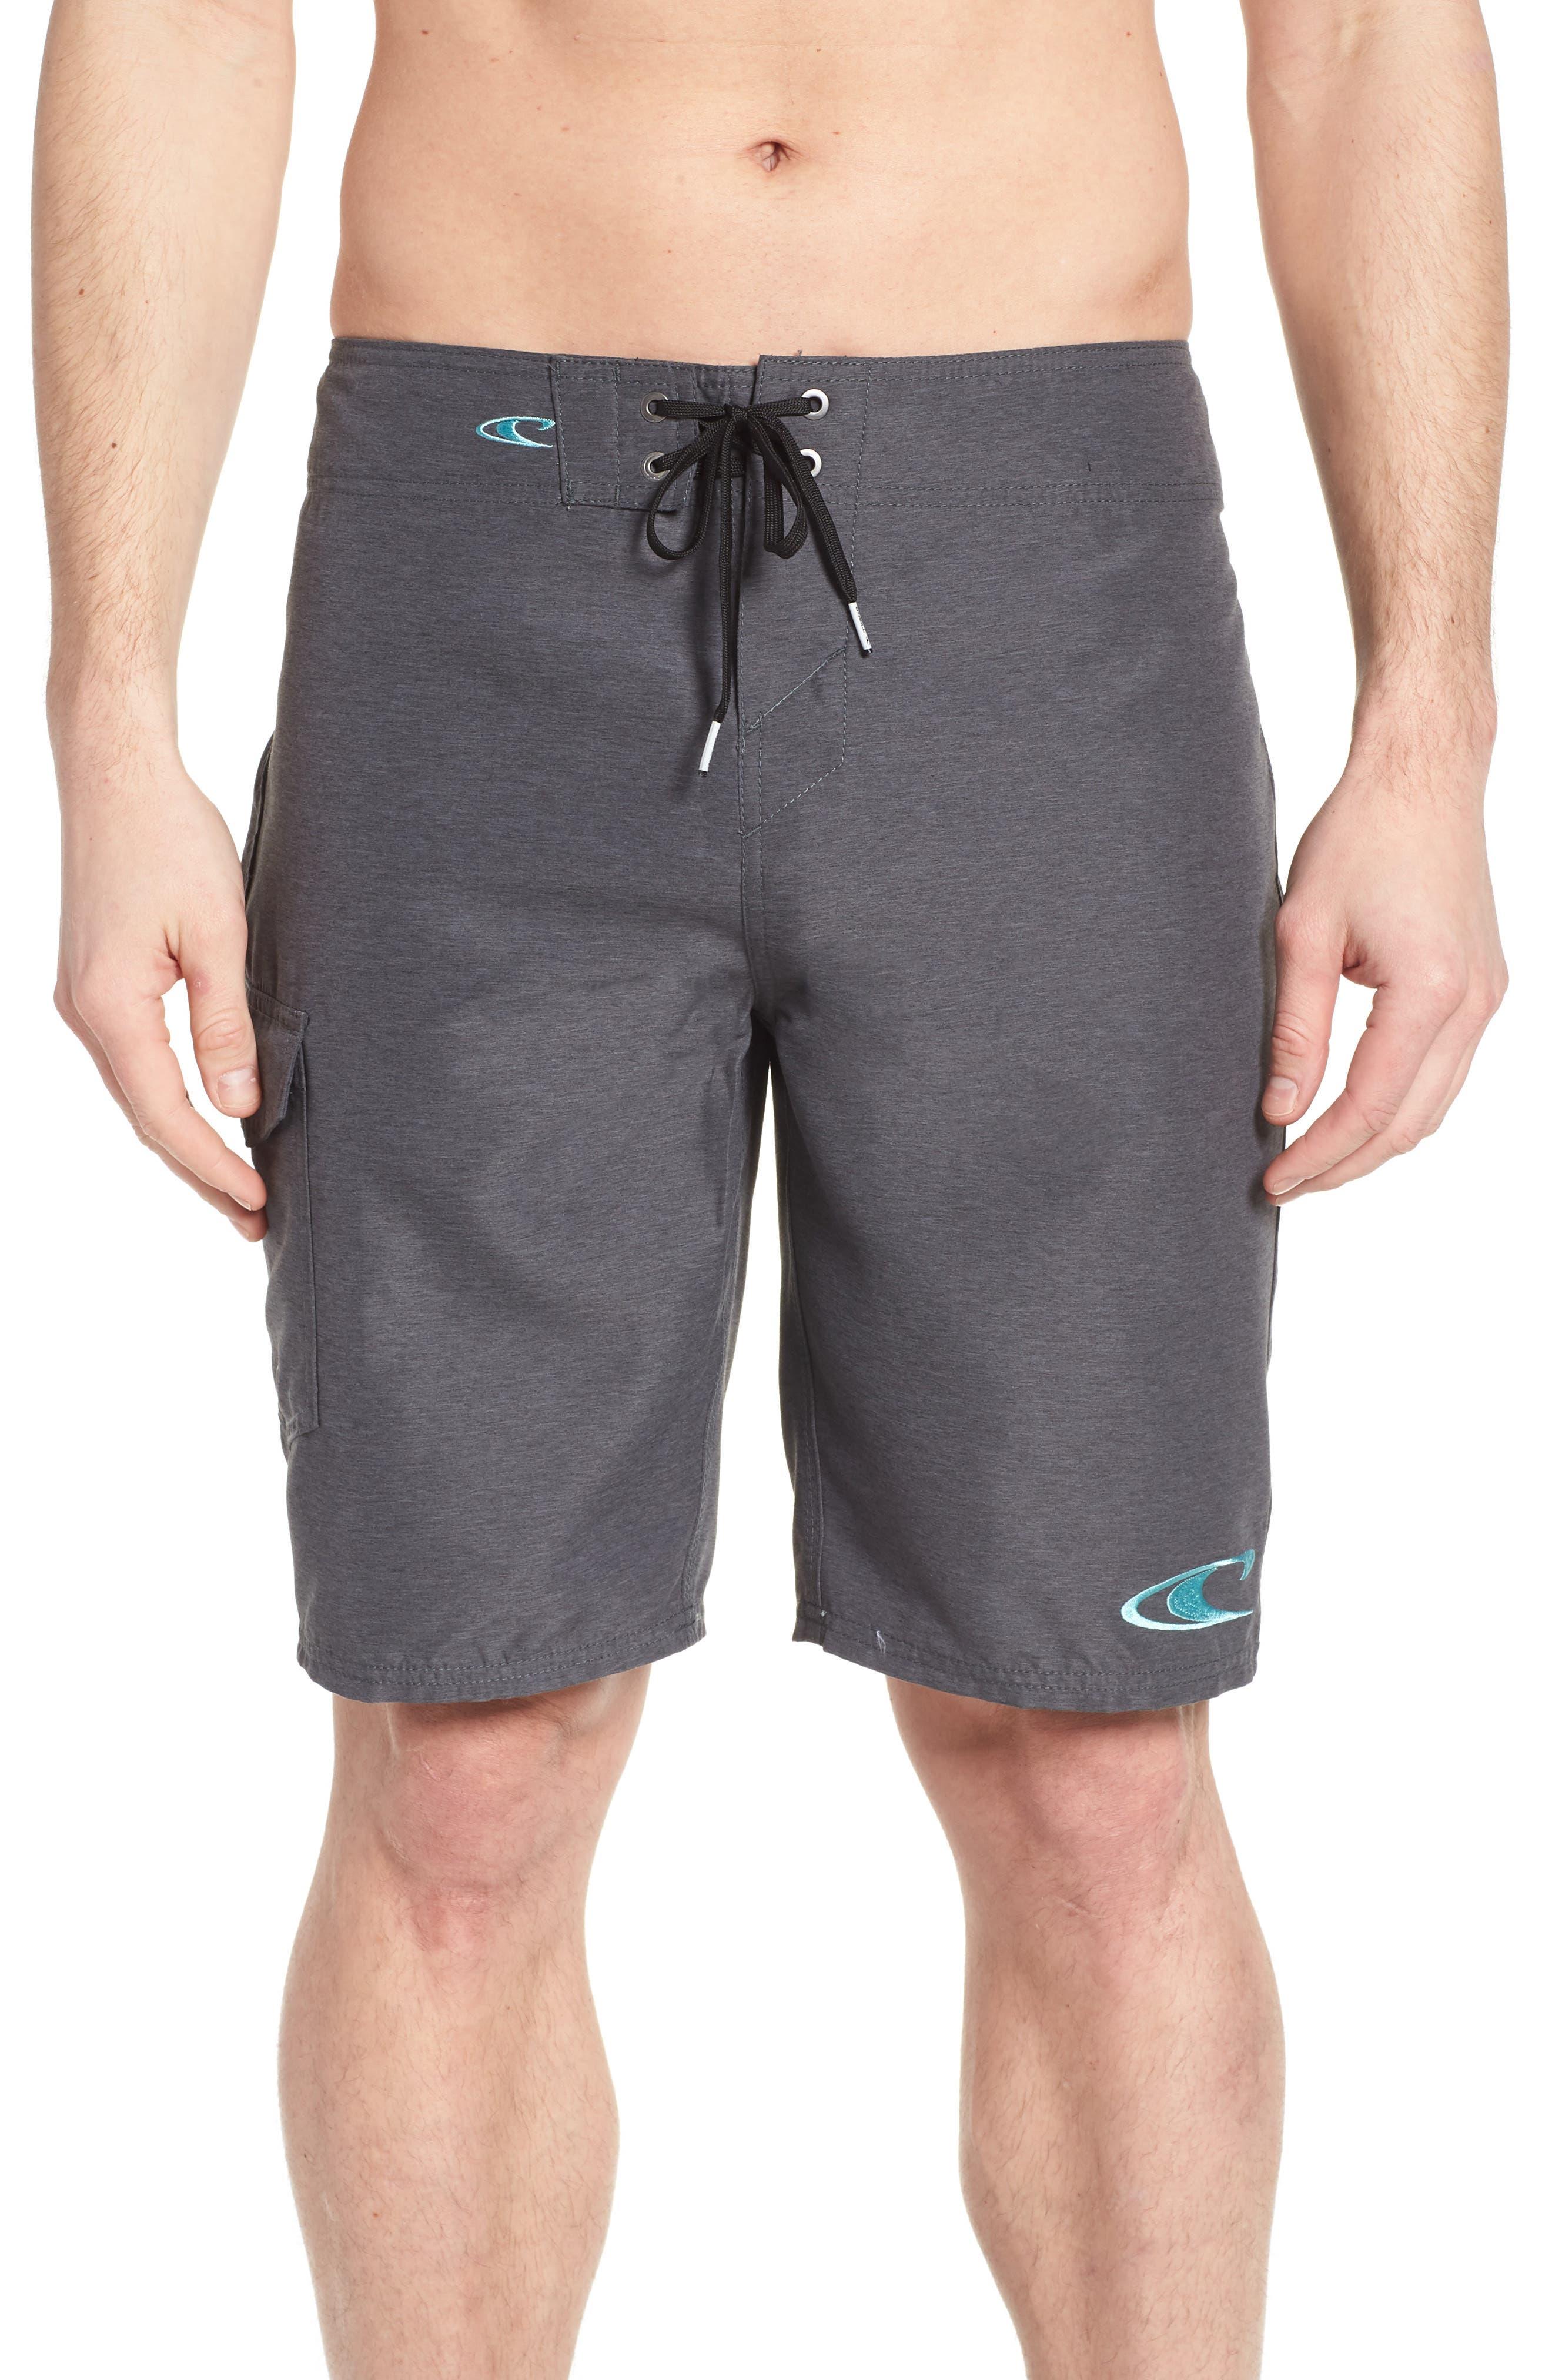 Santa Cruz Board Shorts,                         Main,                         color, 001